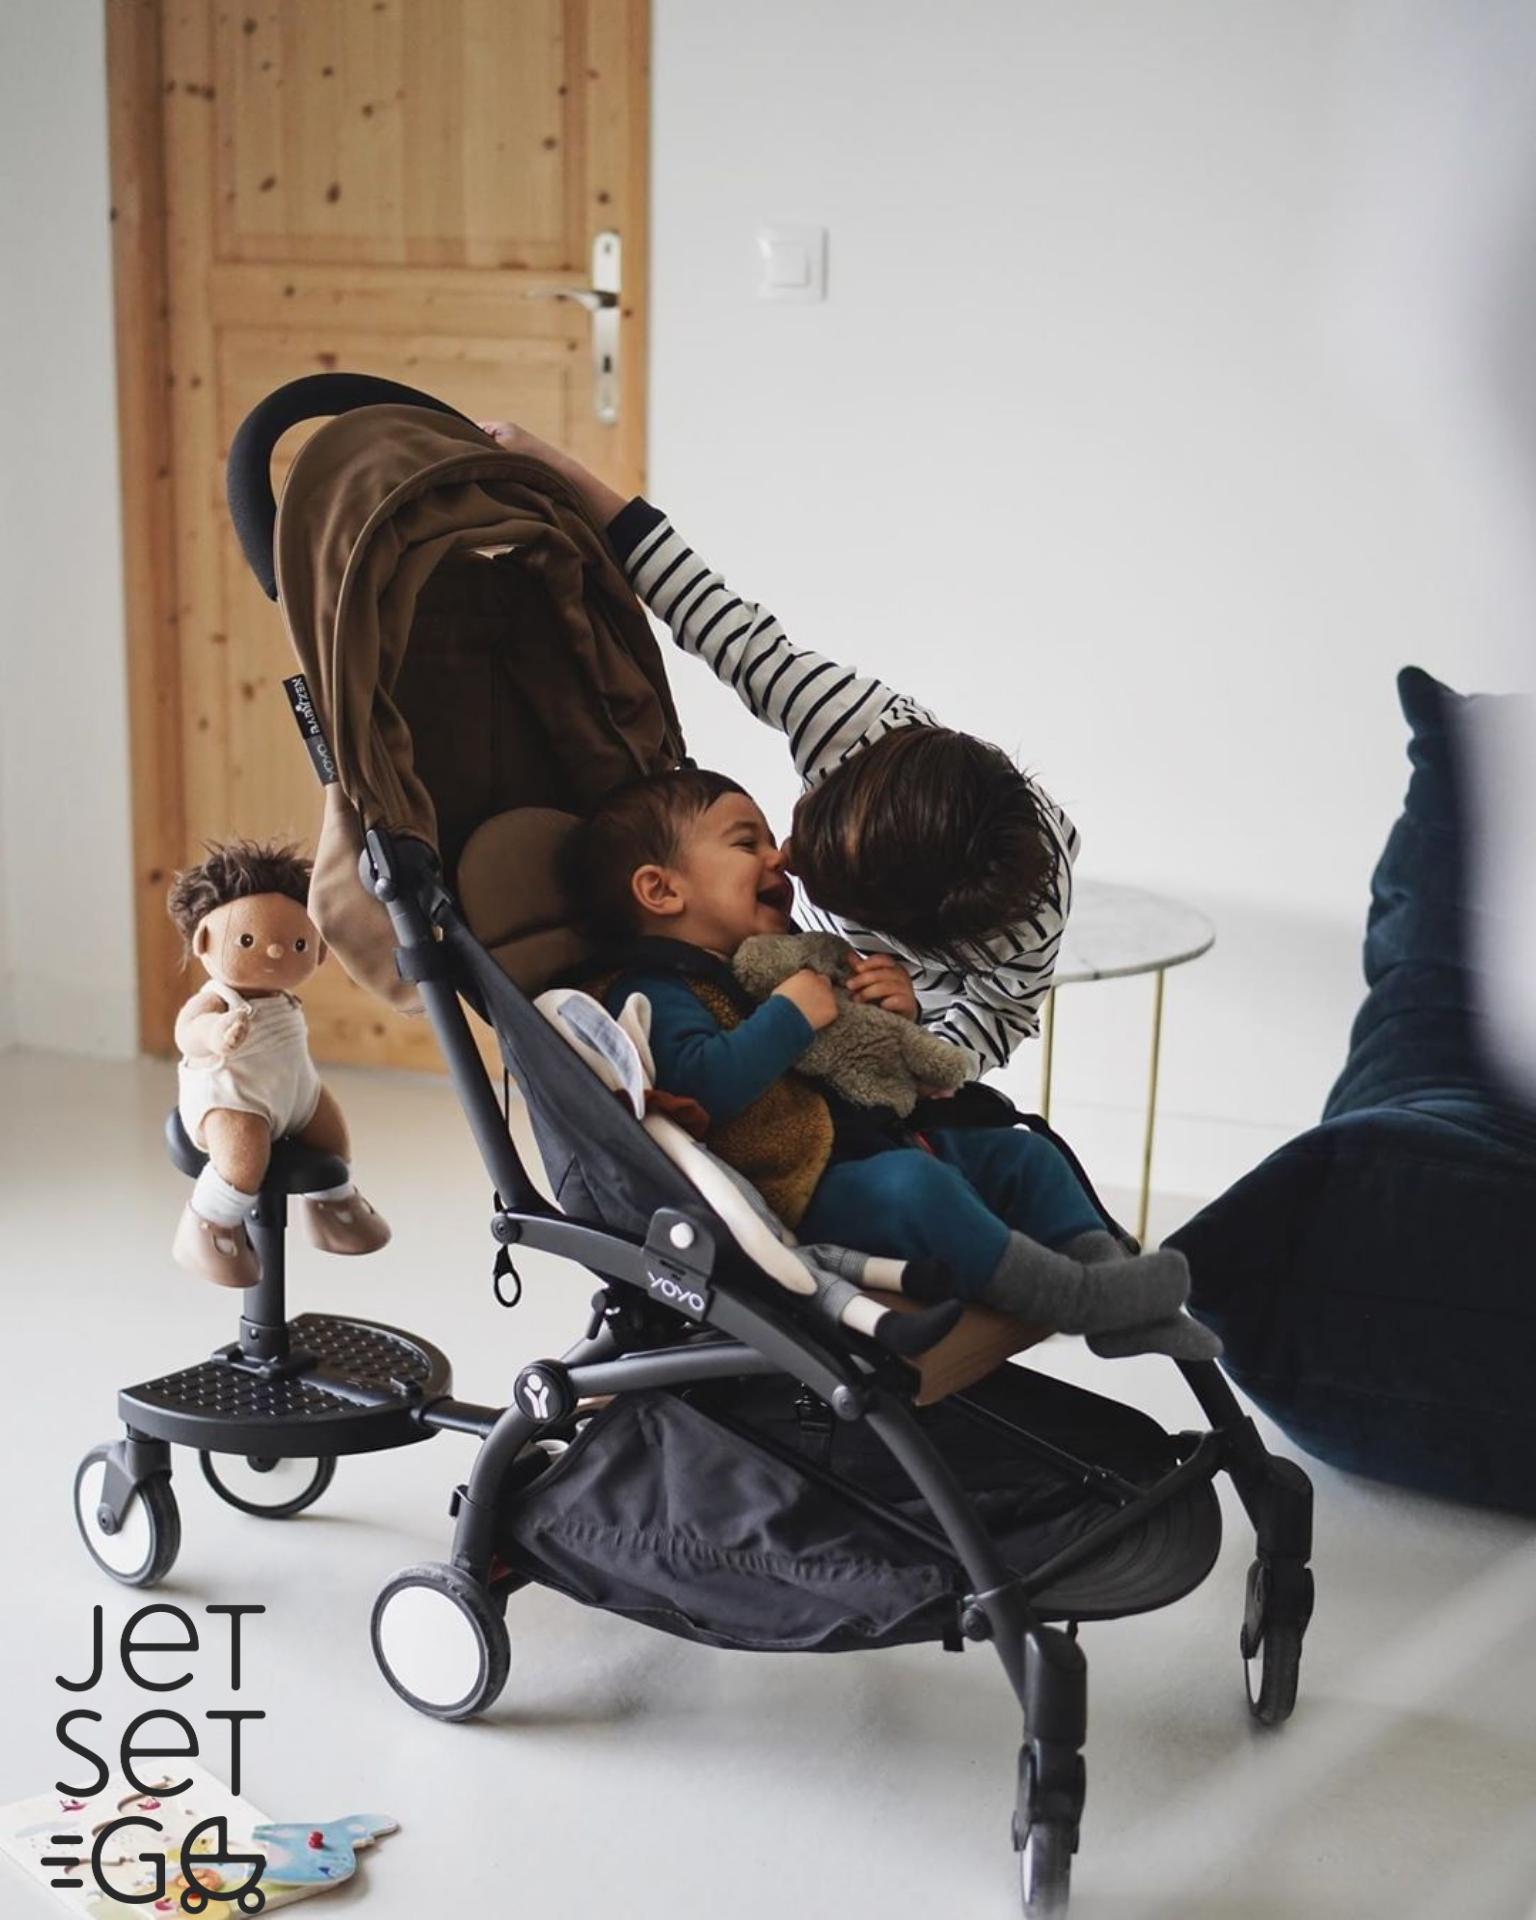 BABYZEN YOYO Stroller in 2020 Babyzen yoyo, Yoyo